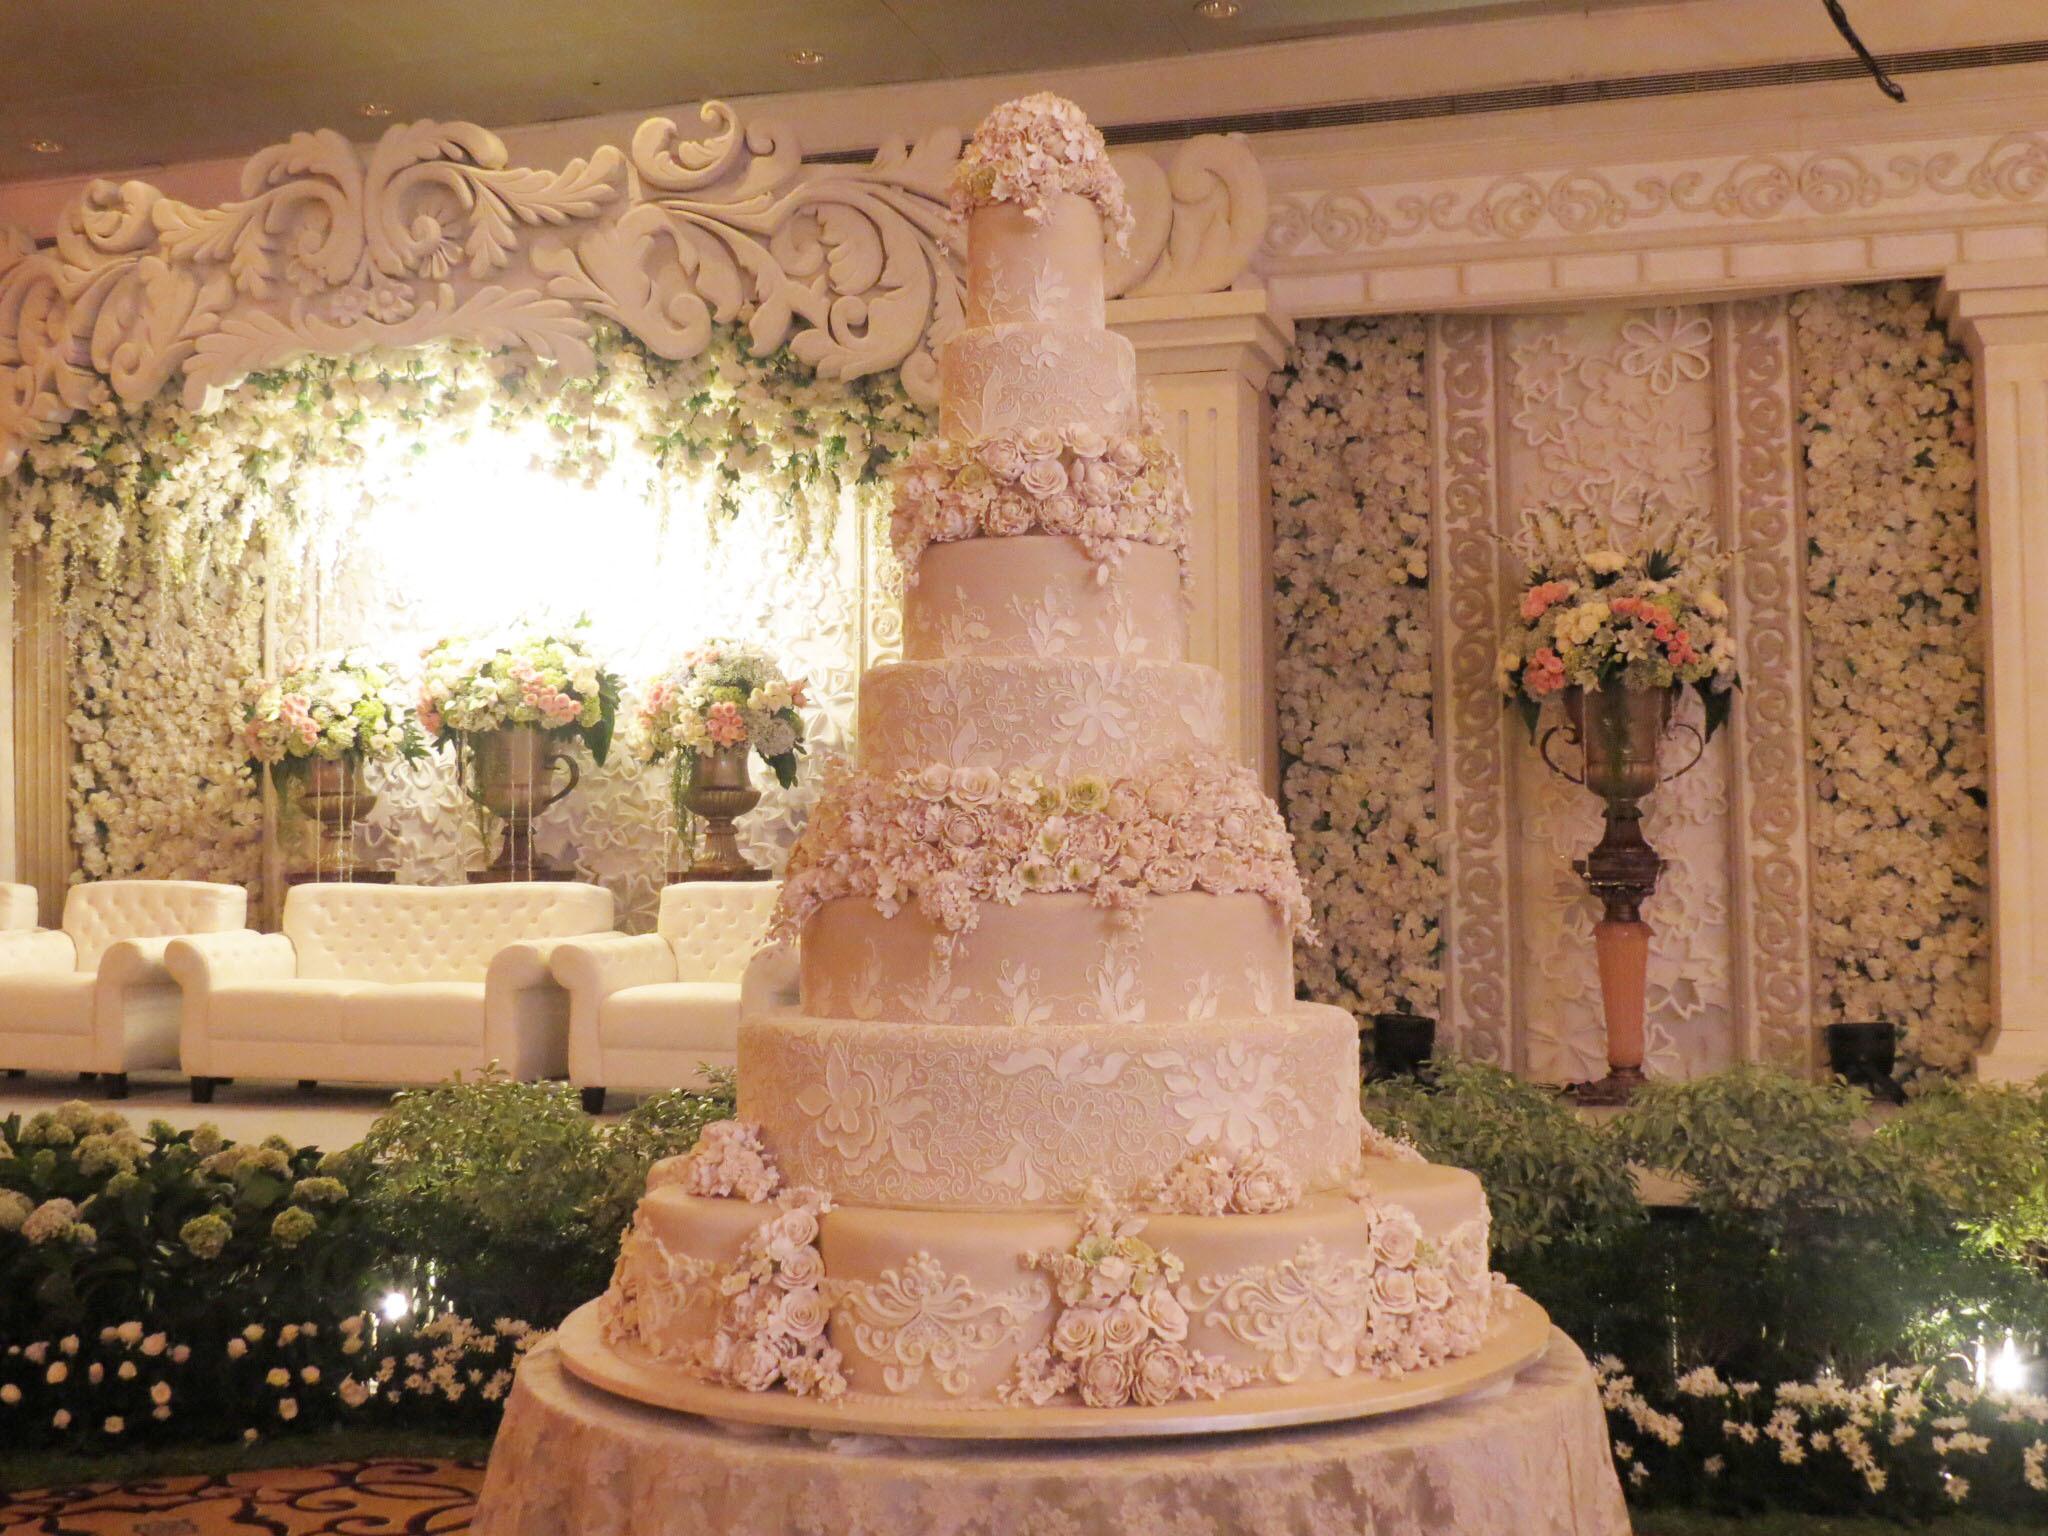 7 Tier Wedding Cakes  Wedding Cake 101 An Introduction to Wedding Cakes